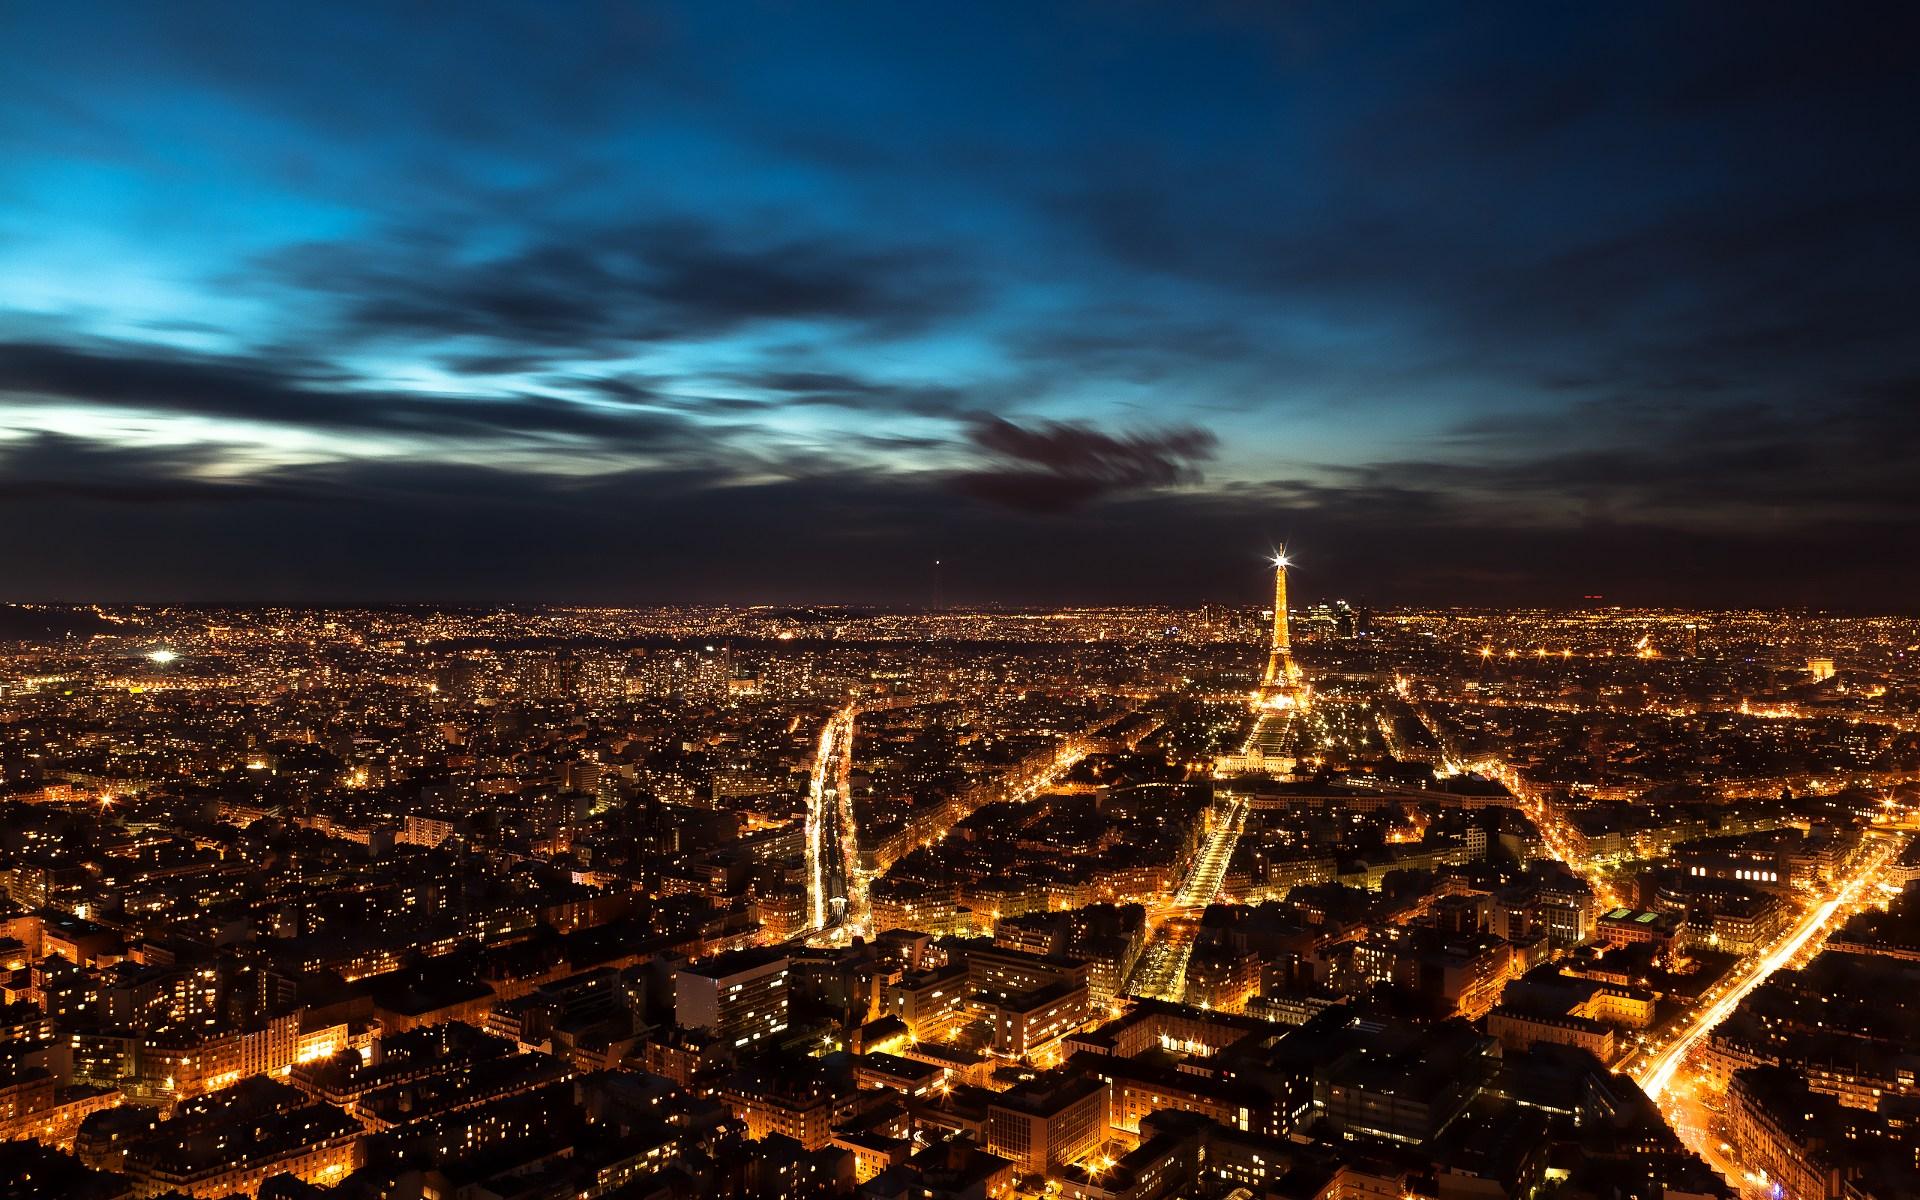 Hd wallpaper paris - Paris Night Sky Hd Wallpaper Theme Bin Customization Hd